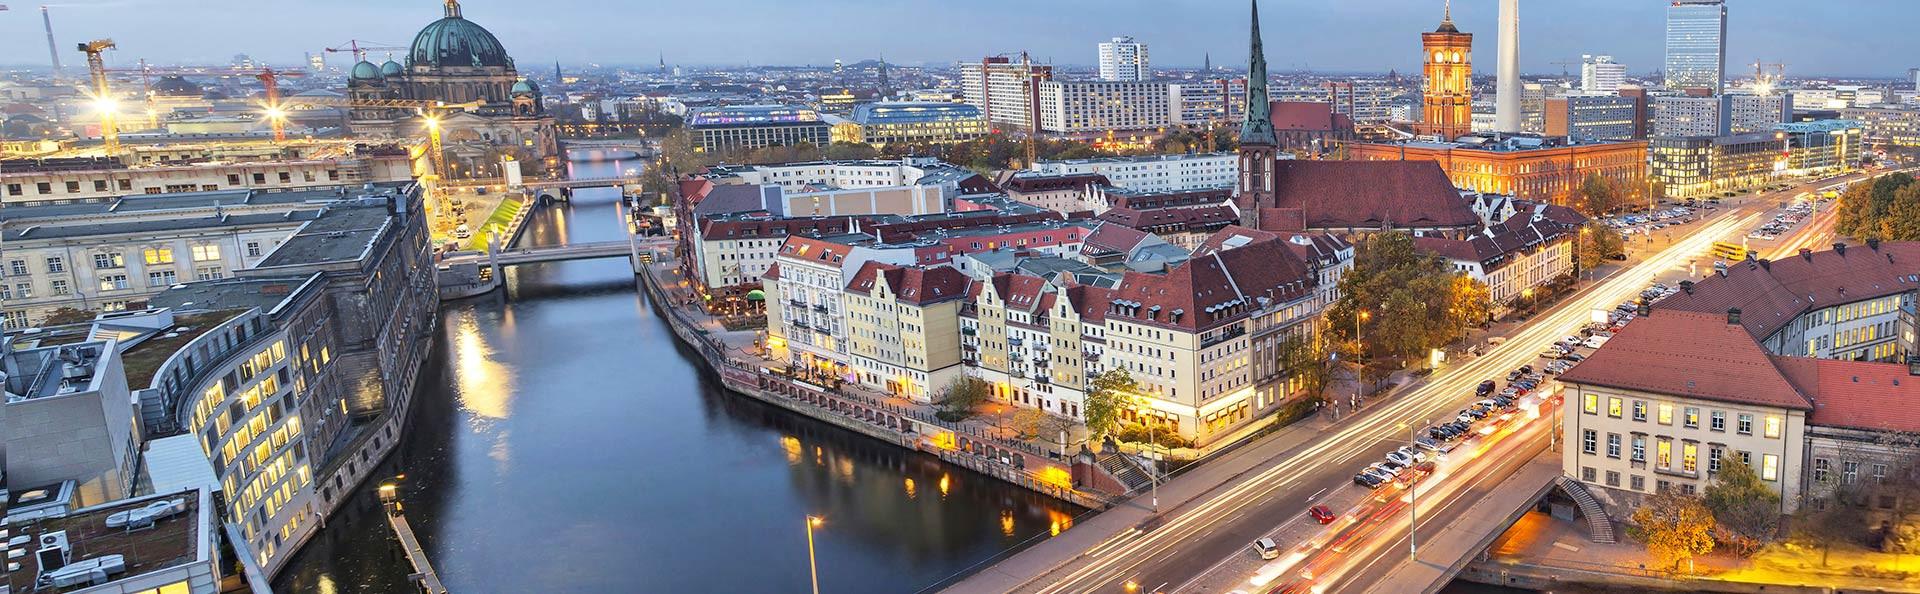 Wohnung In Berlin Mieten  APARTBERLIN – Immobilien mieten in Berlin